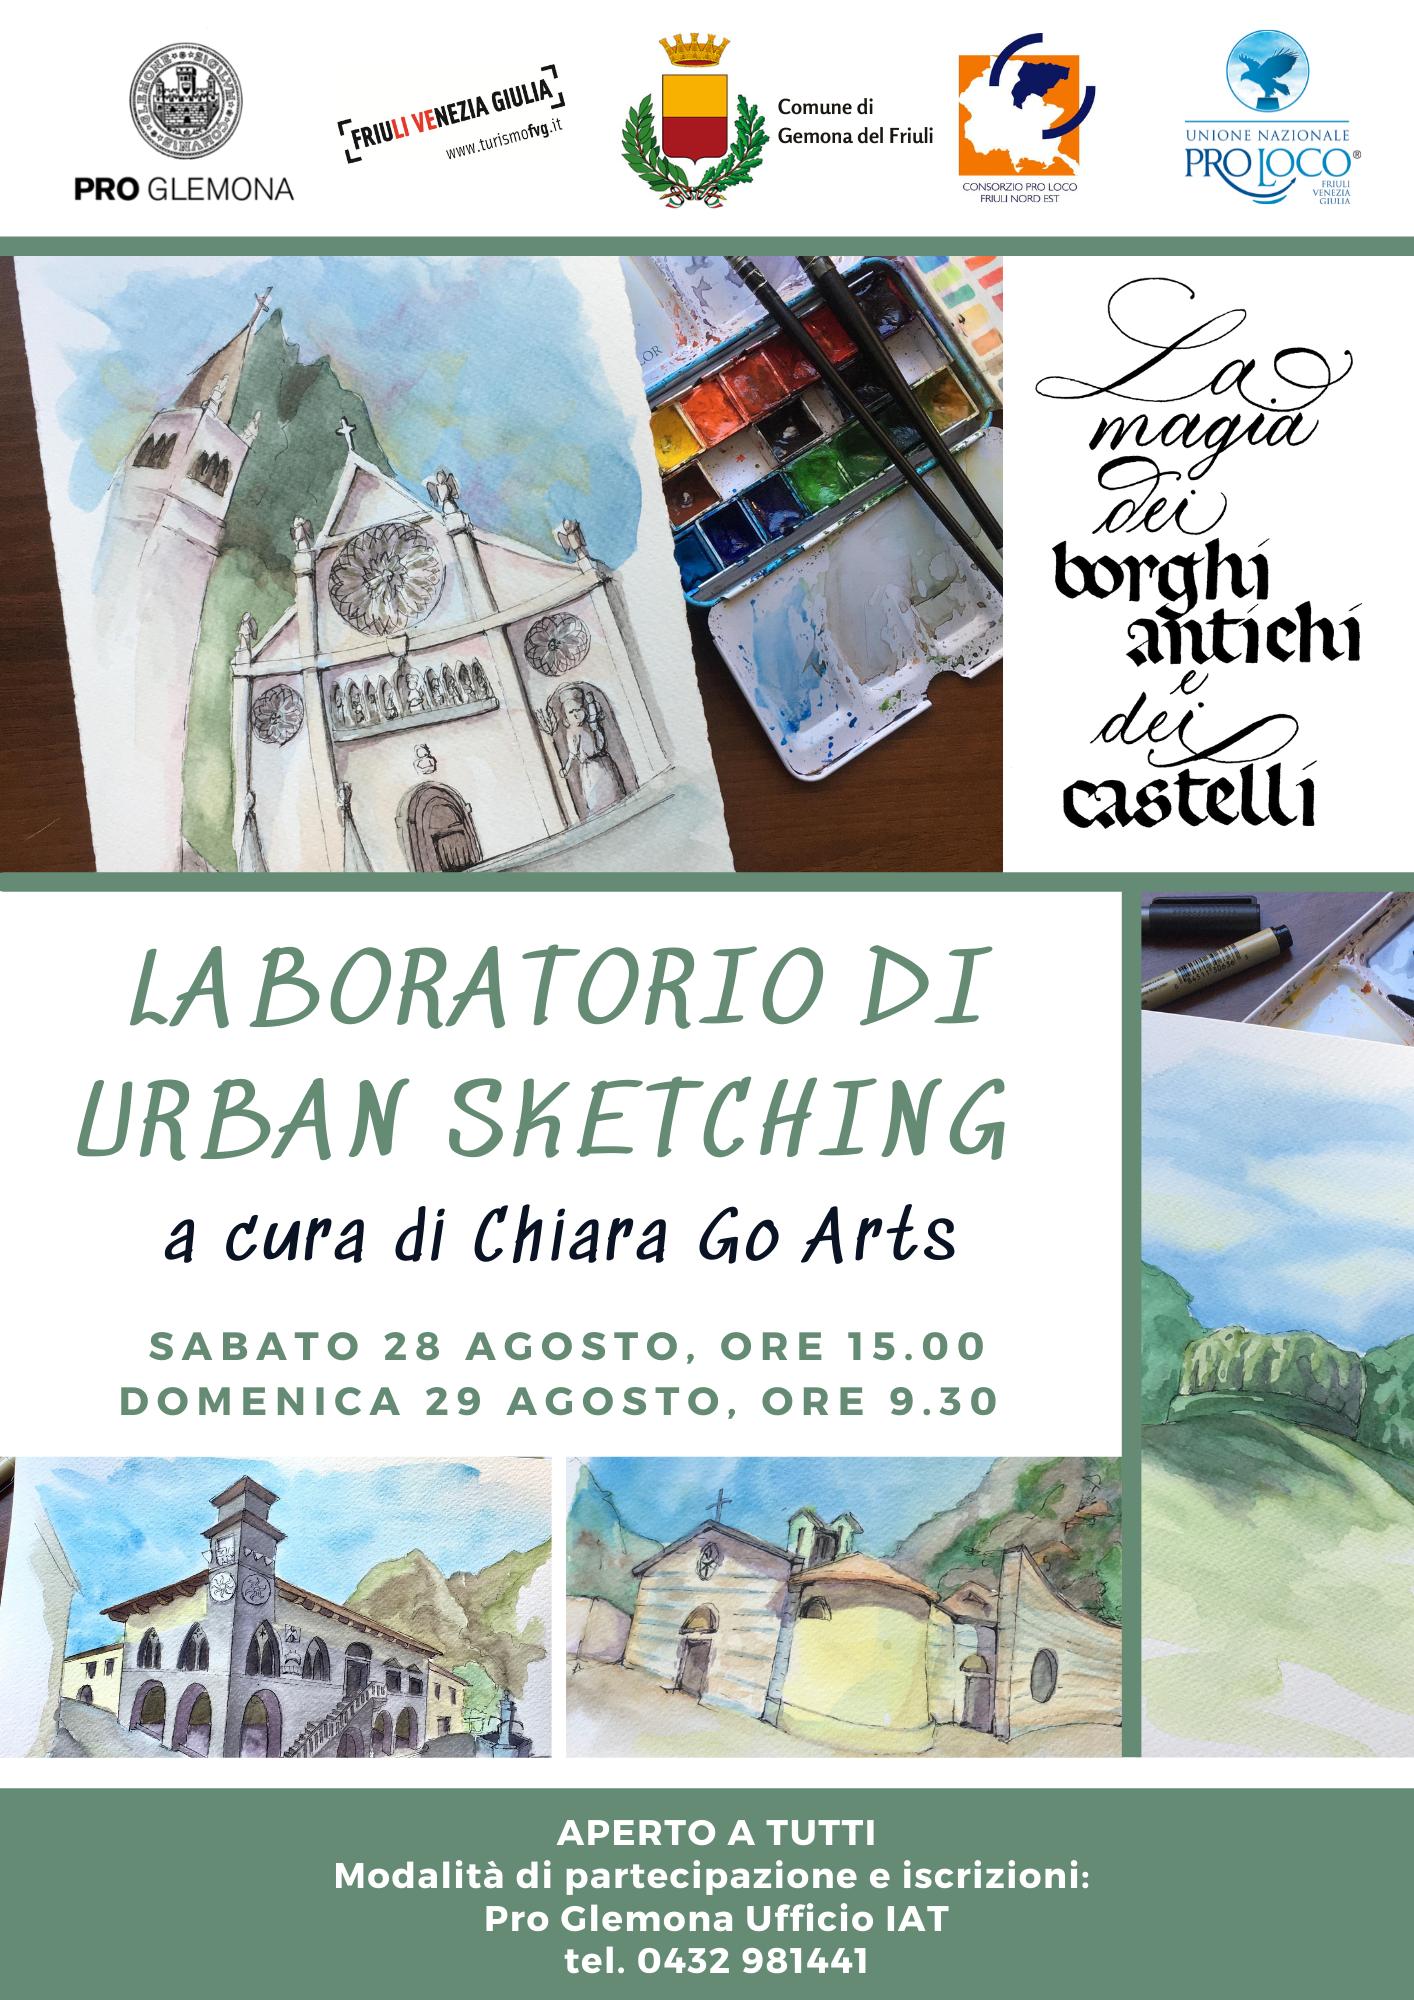 Urban Sketching in Friuli